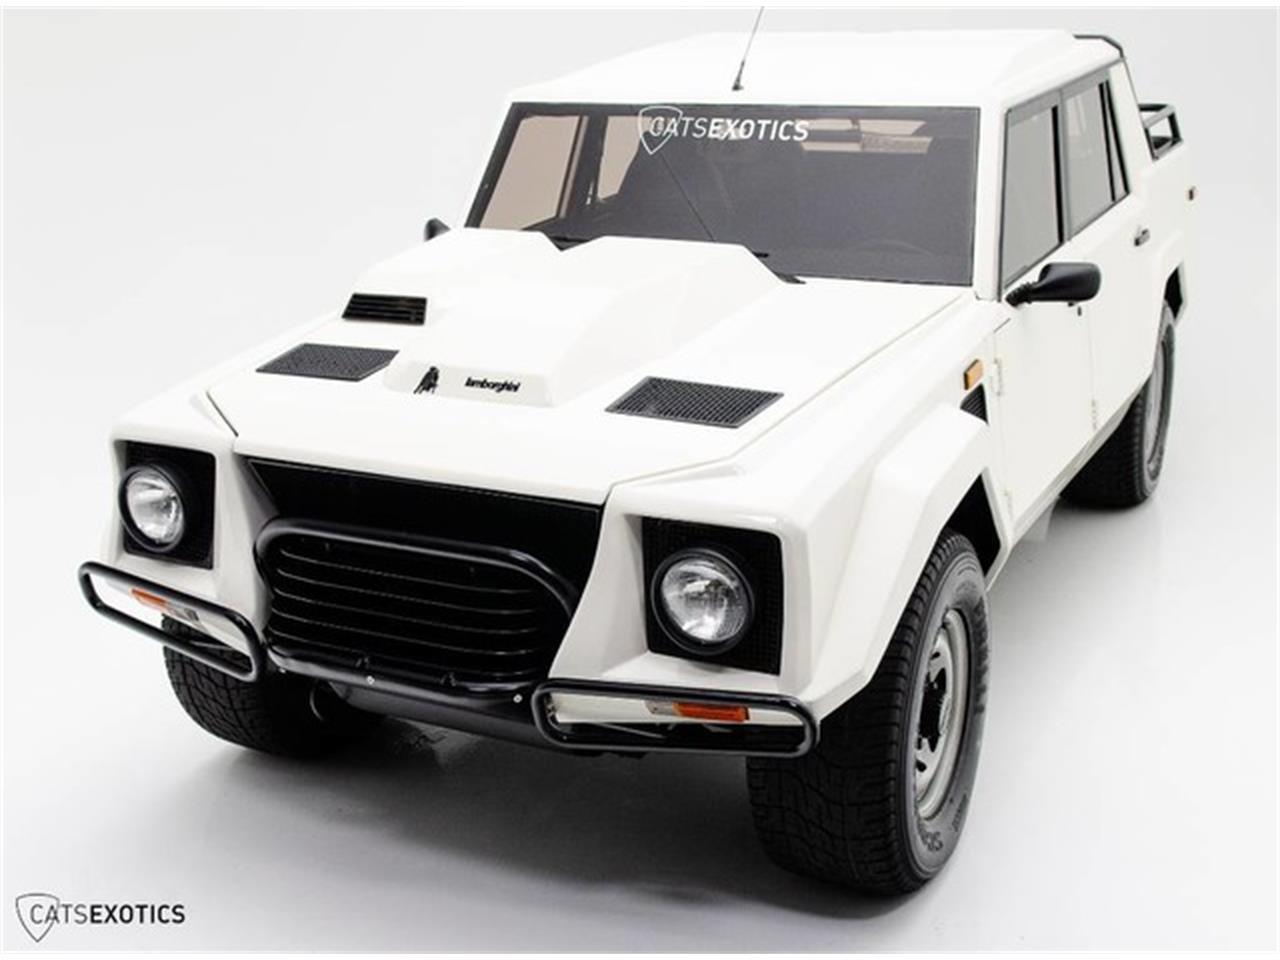 1988 Lamborghini Lm002 For Sale Classiccars Com Cc 1145742